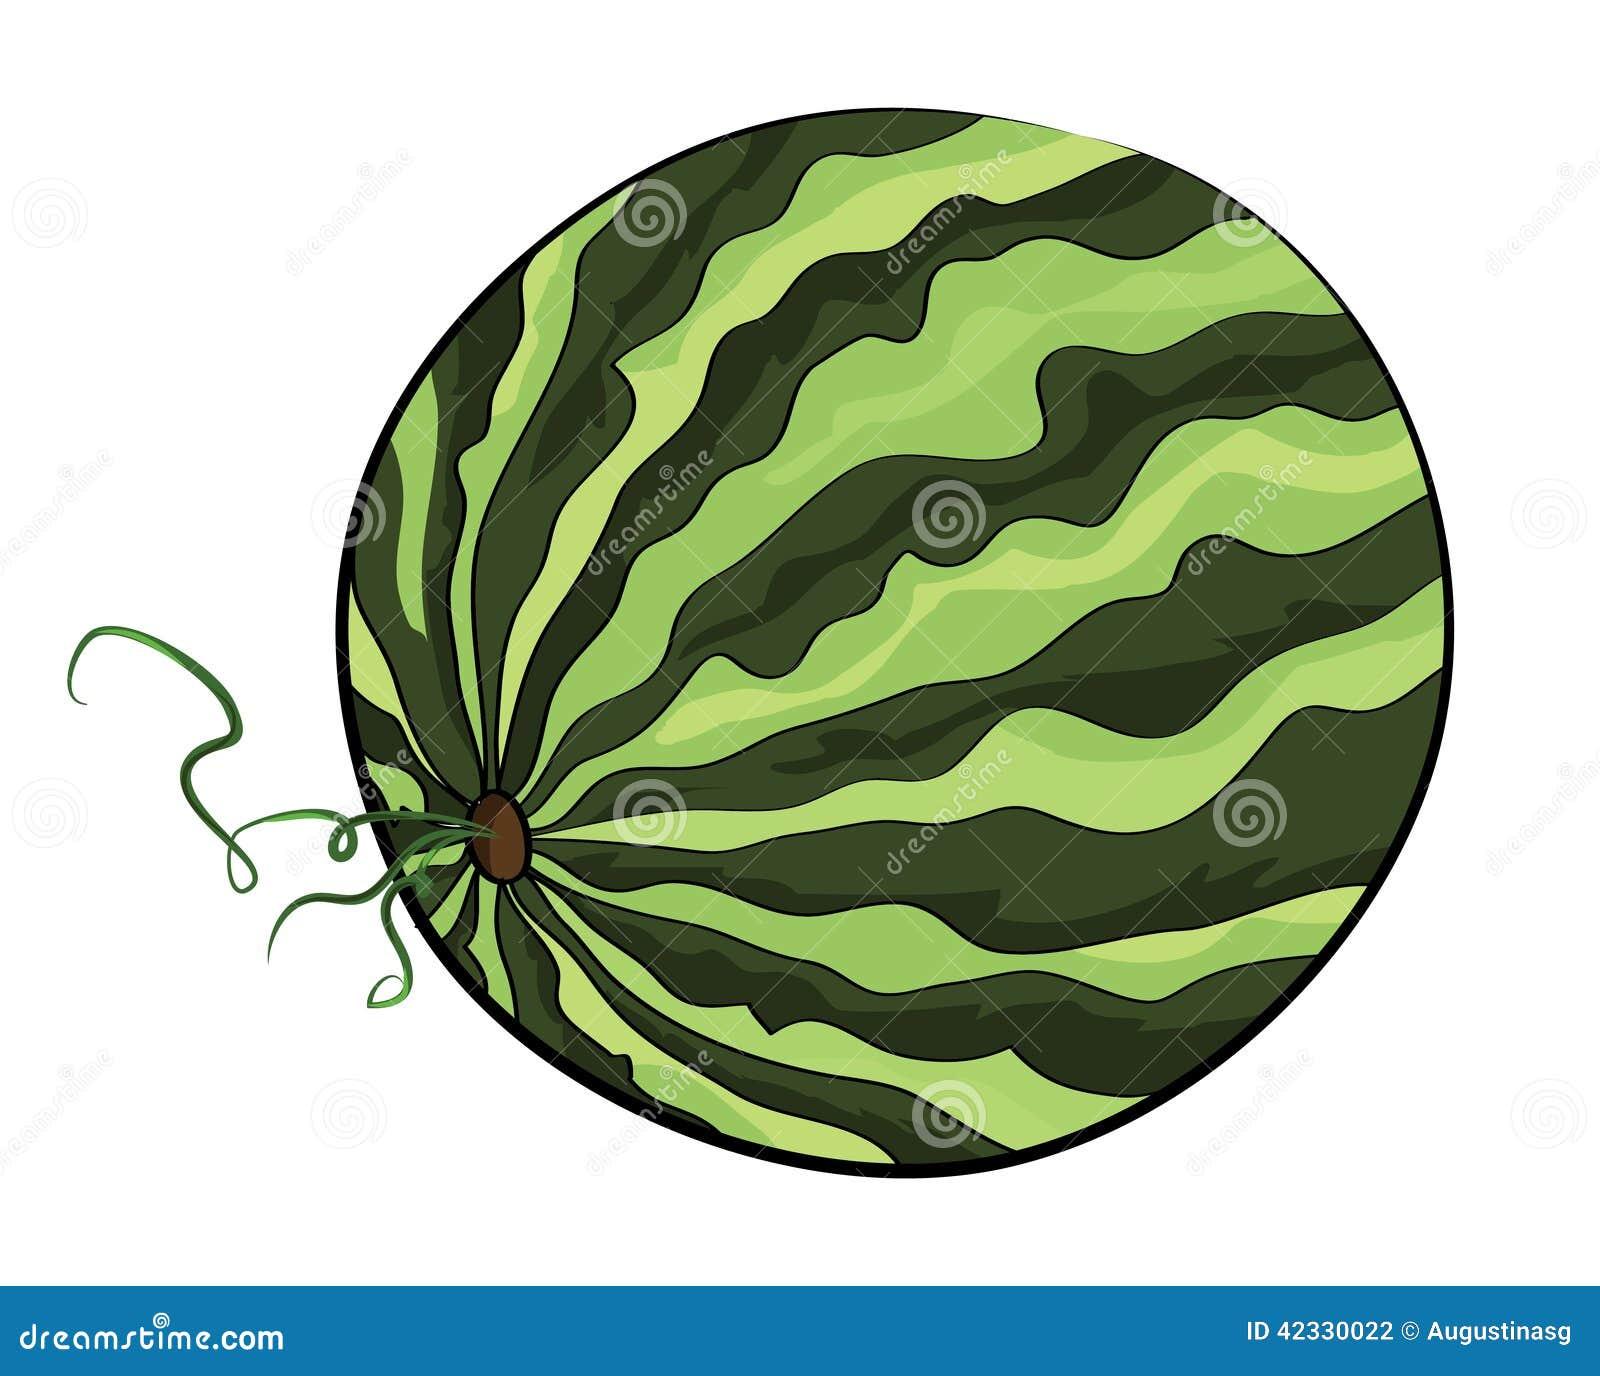 Illustration Of A Watermelon Cartoon Vector ...